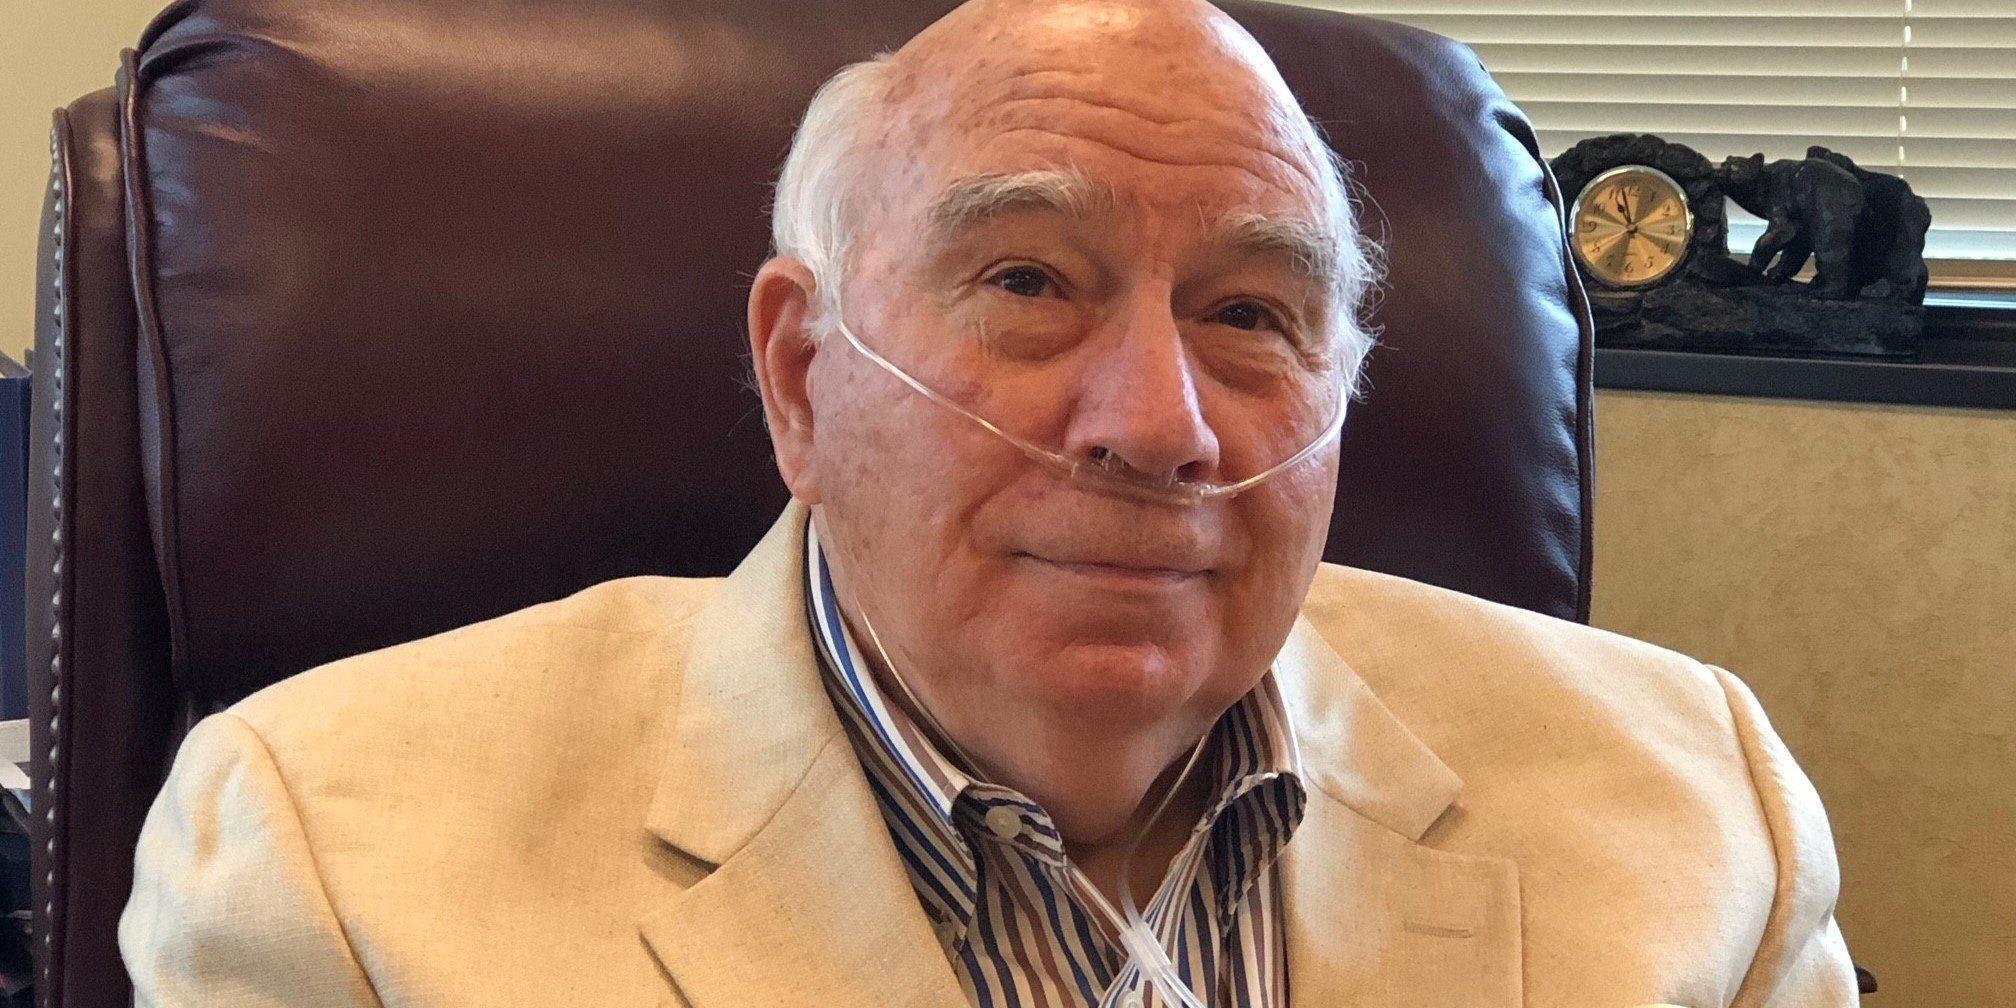 Coal CEO Bob Murray dies after filing for black lung benefits - Electrek